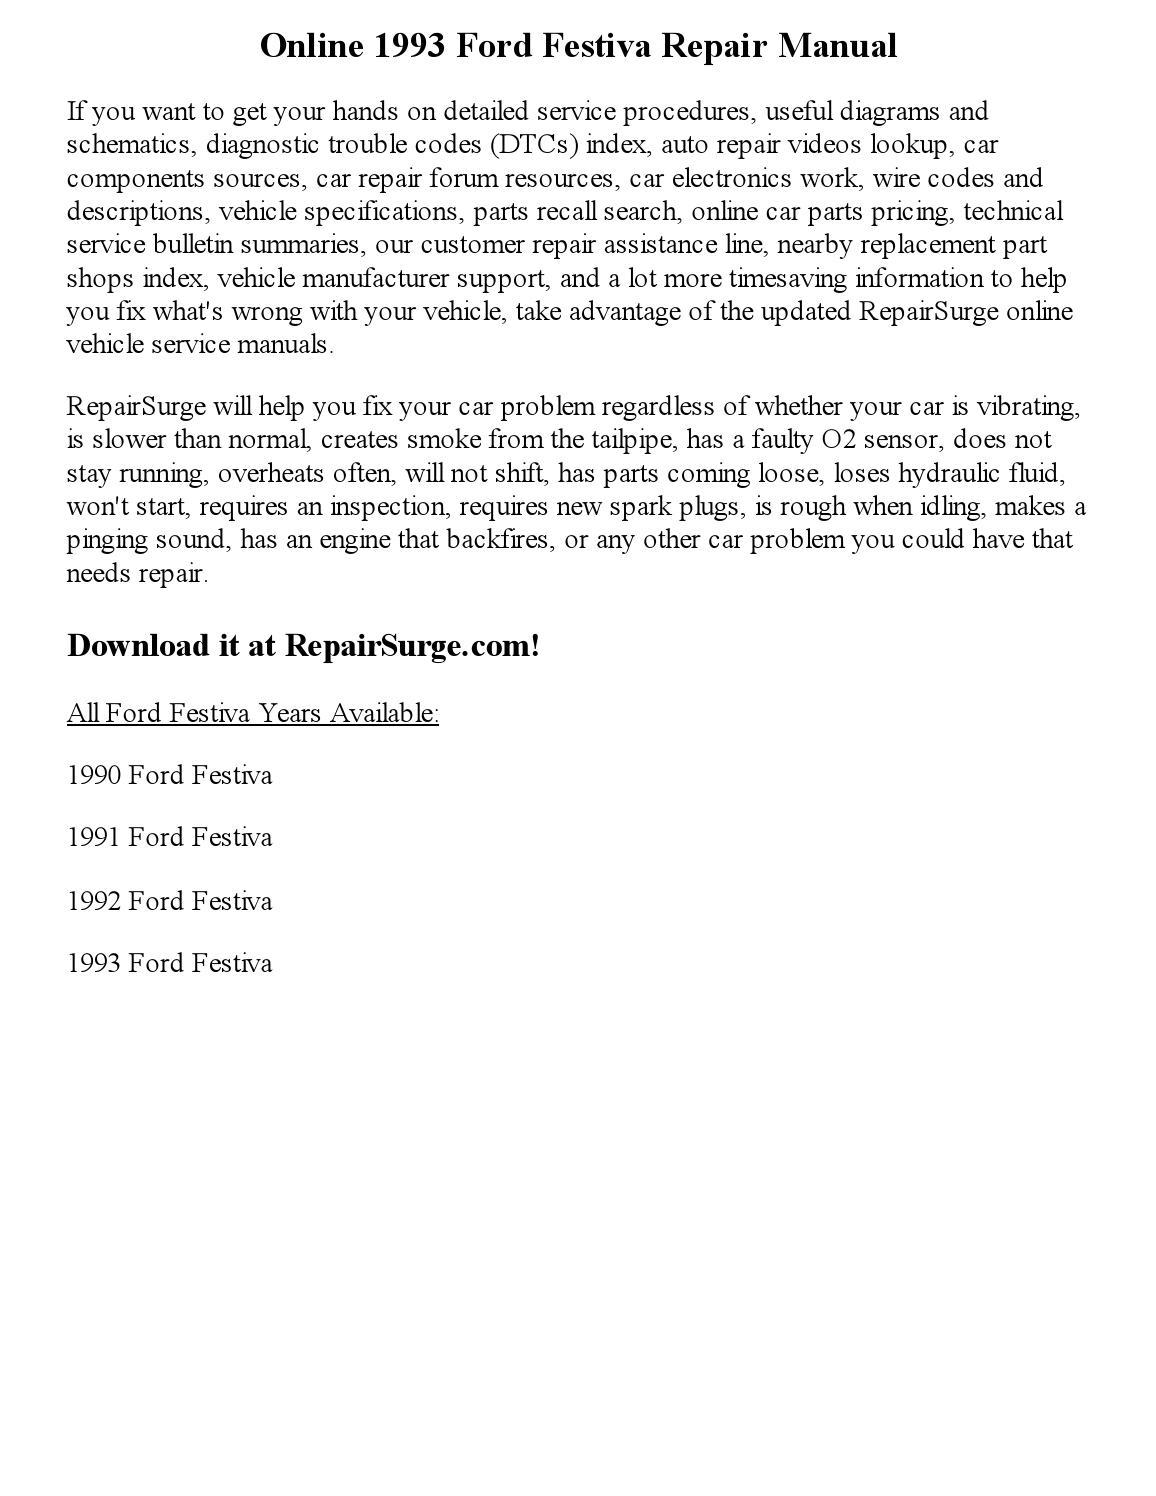 1993 Ford Festiva Repair Manual Online By Jackson Paul Issuu 93 Wiring Diagram